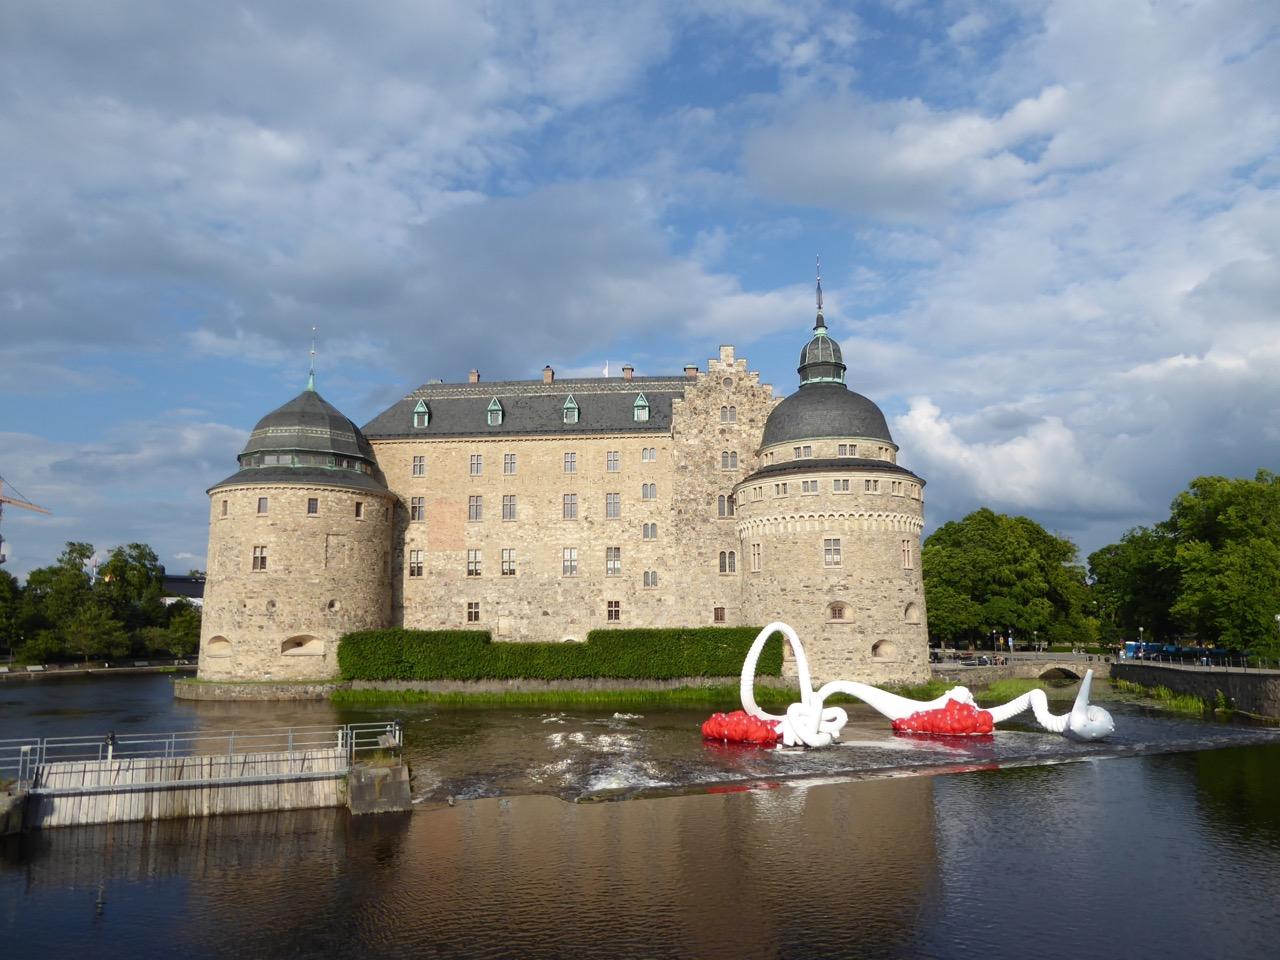 Foxcon Örebro